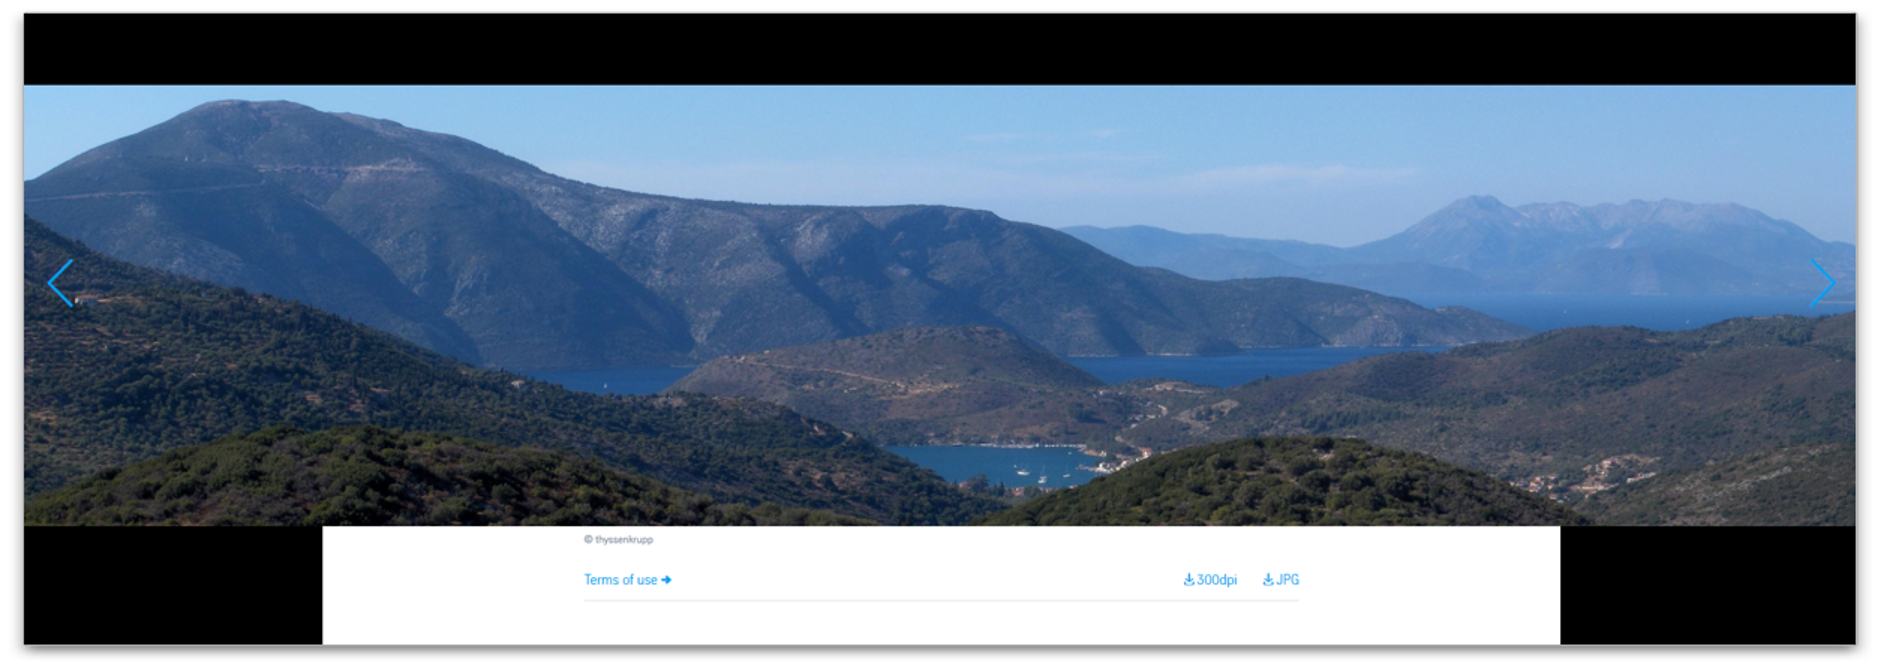 Image Panorama - Modulansicht